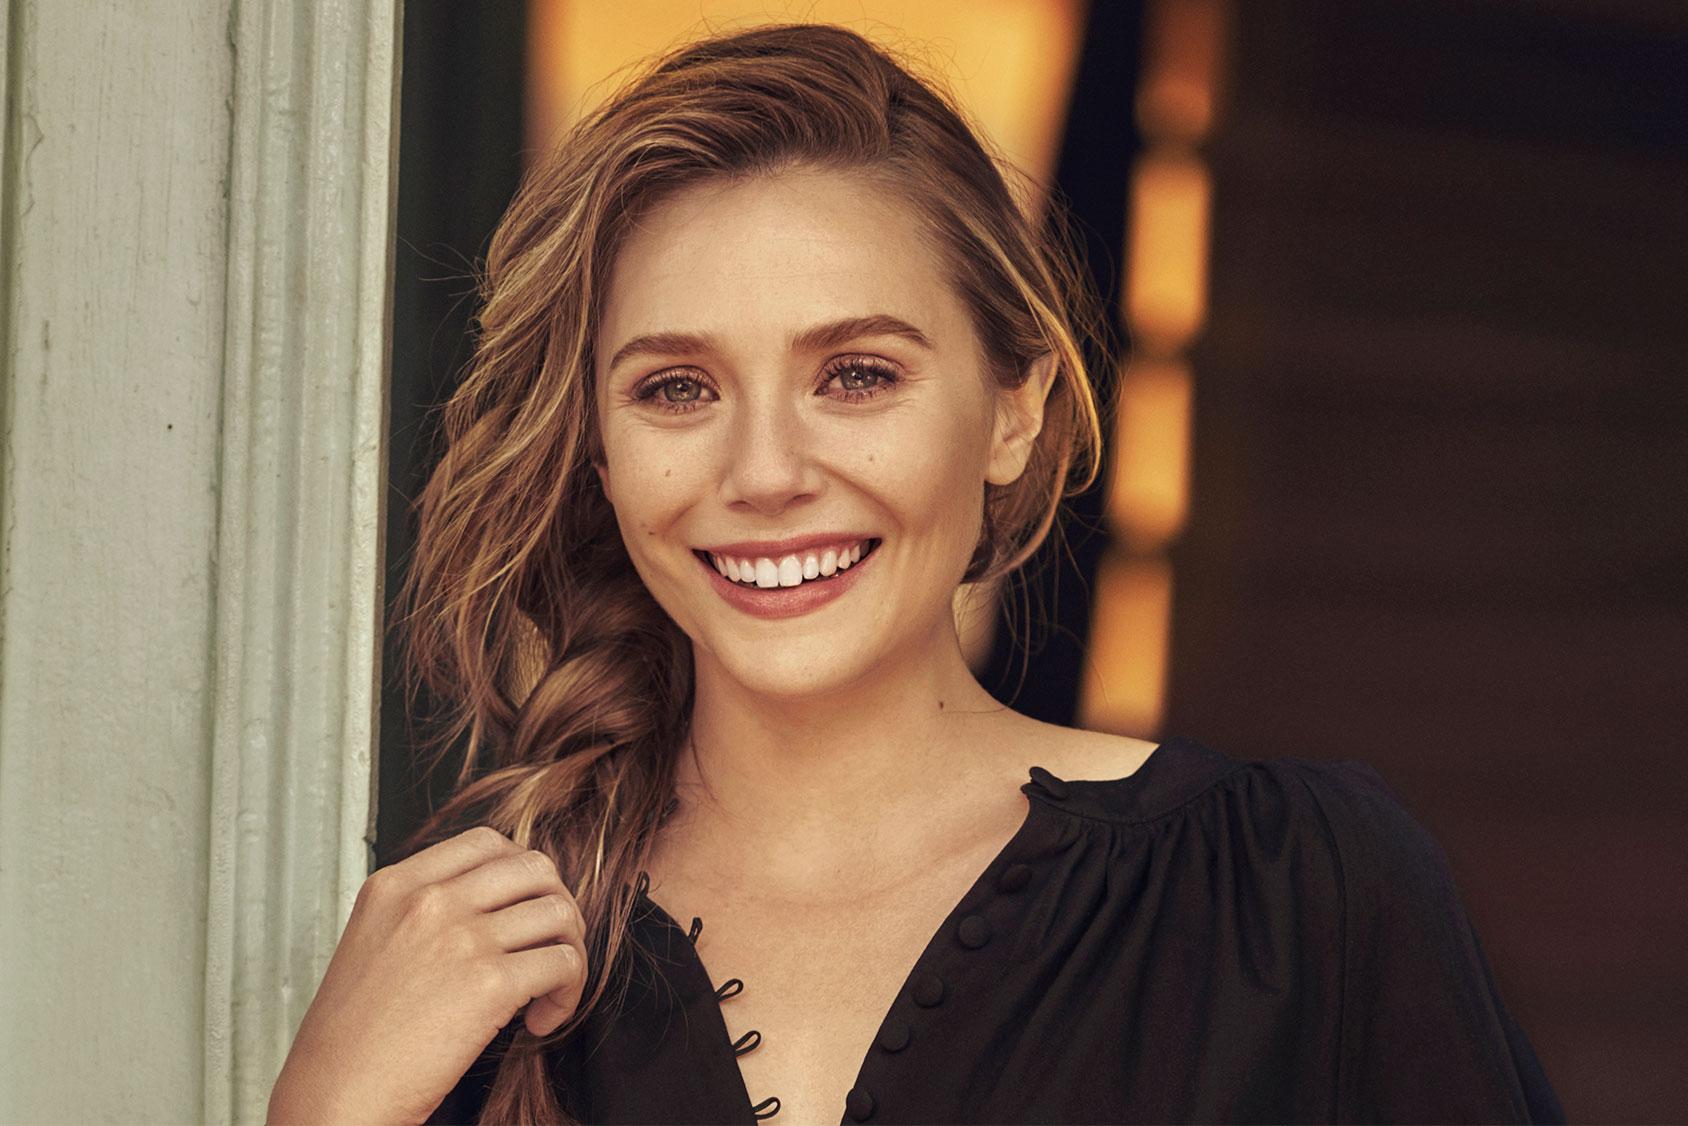 Elizabeth Olsen H&M